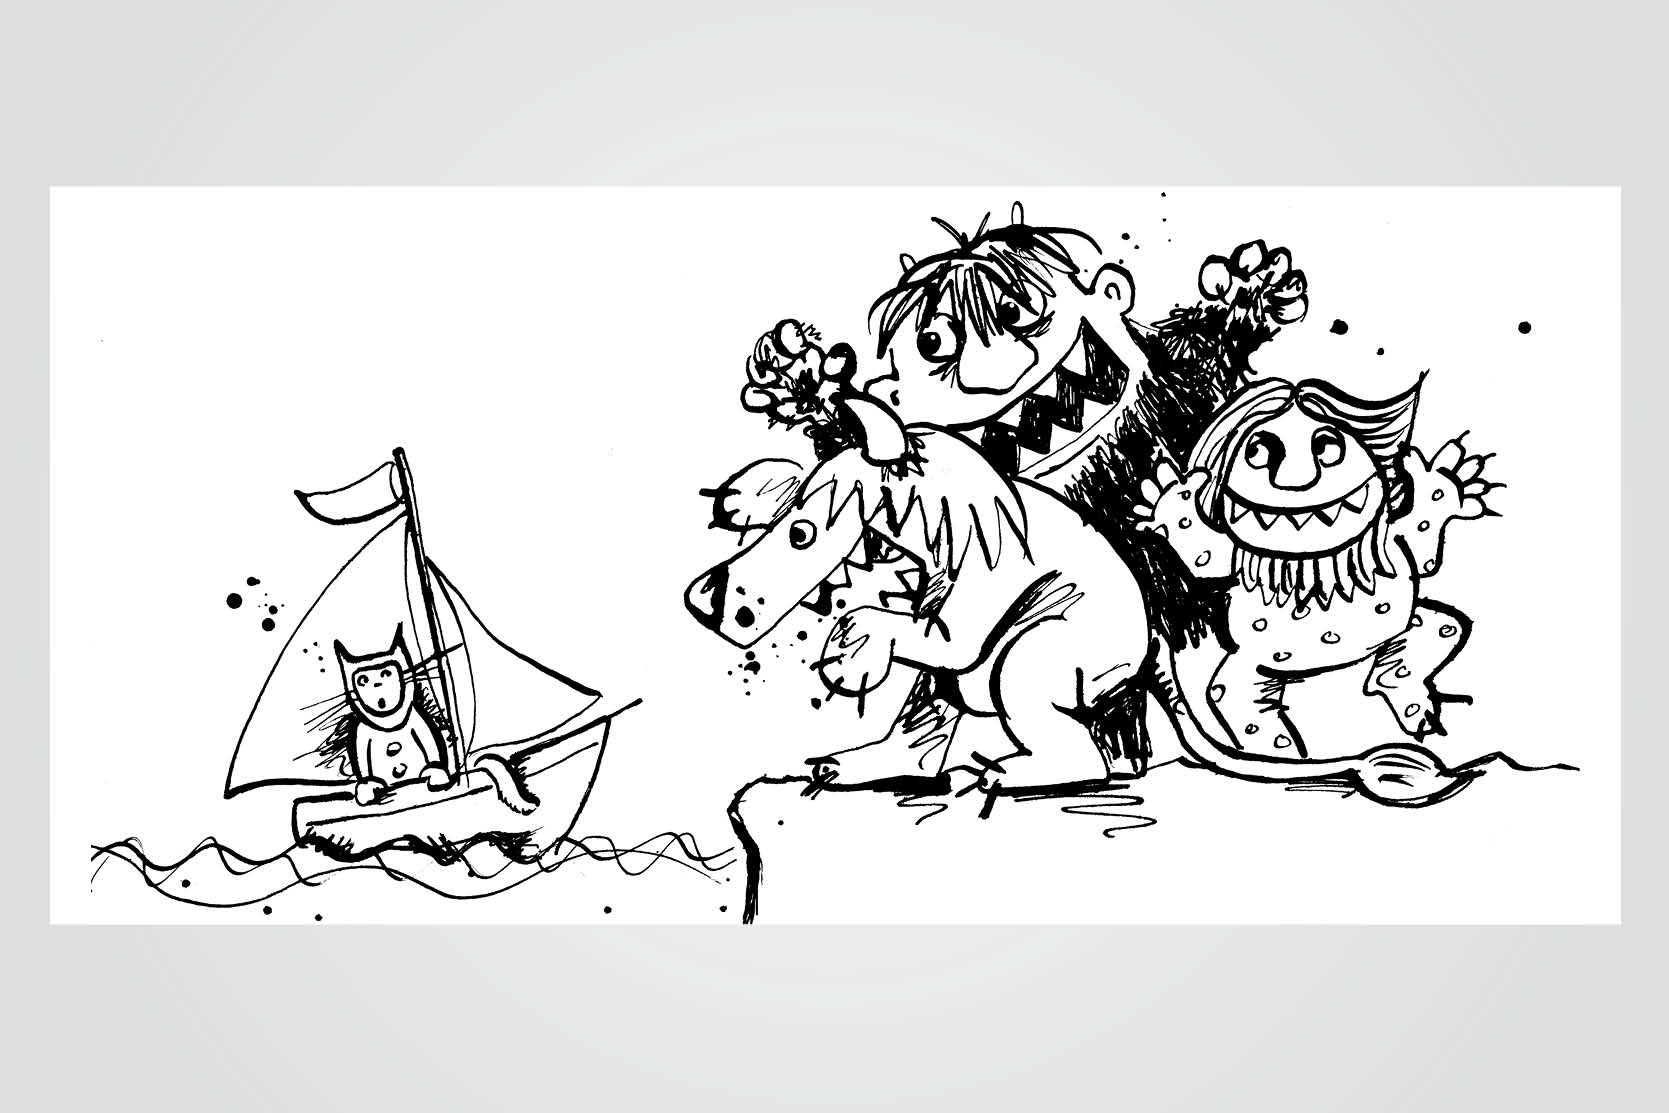 kinobecher-illustration-stadtwerke-essen-12.jpg